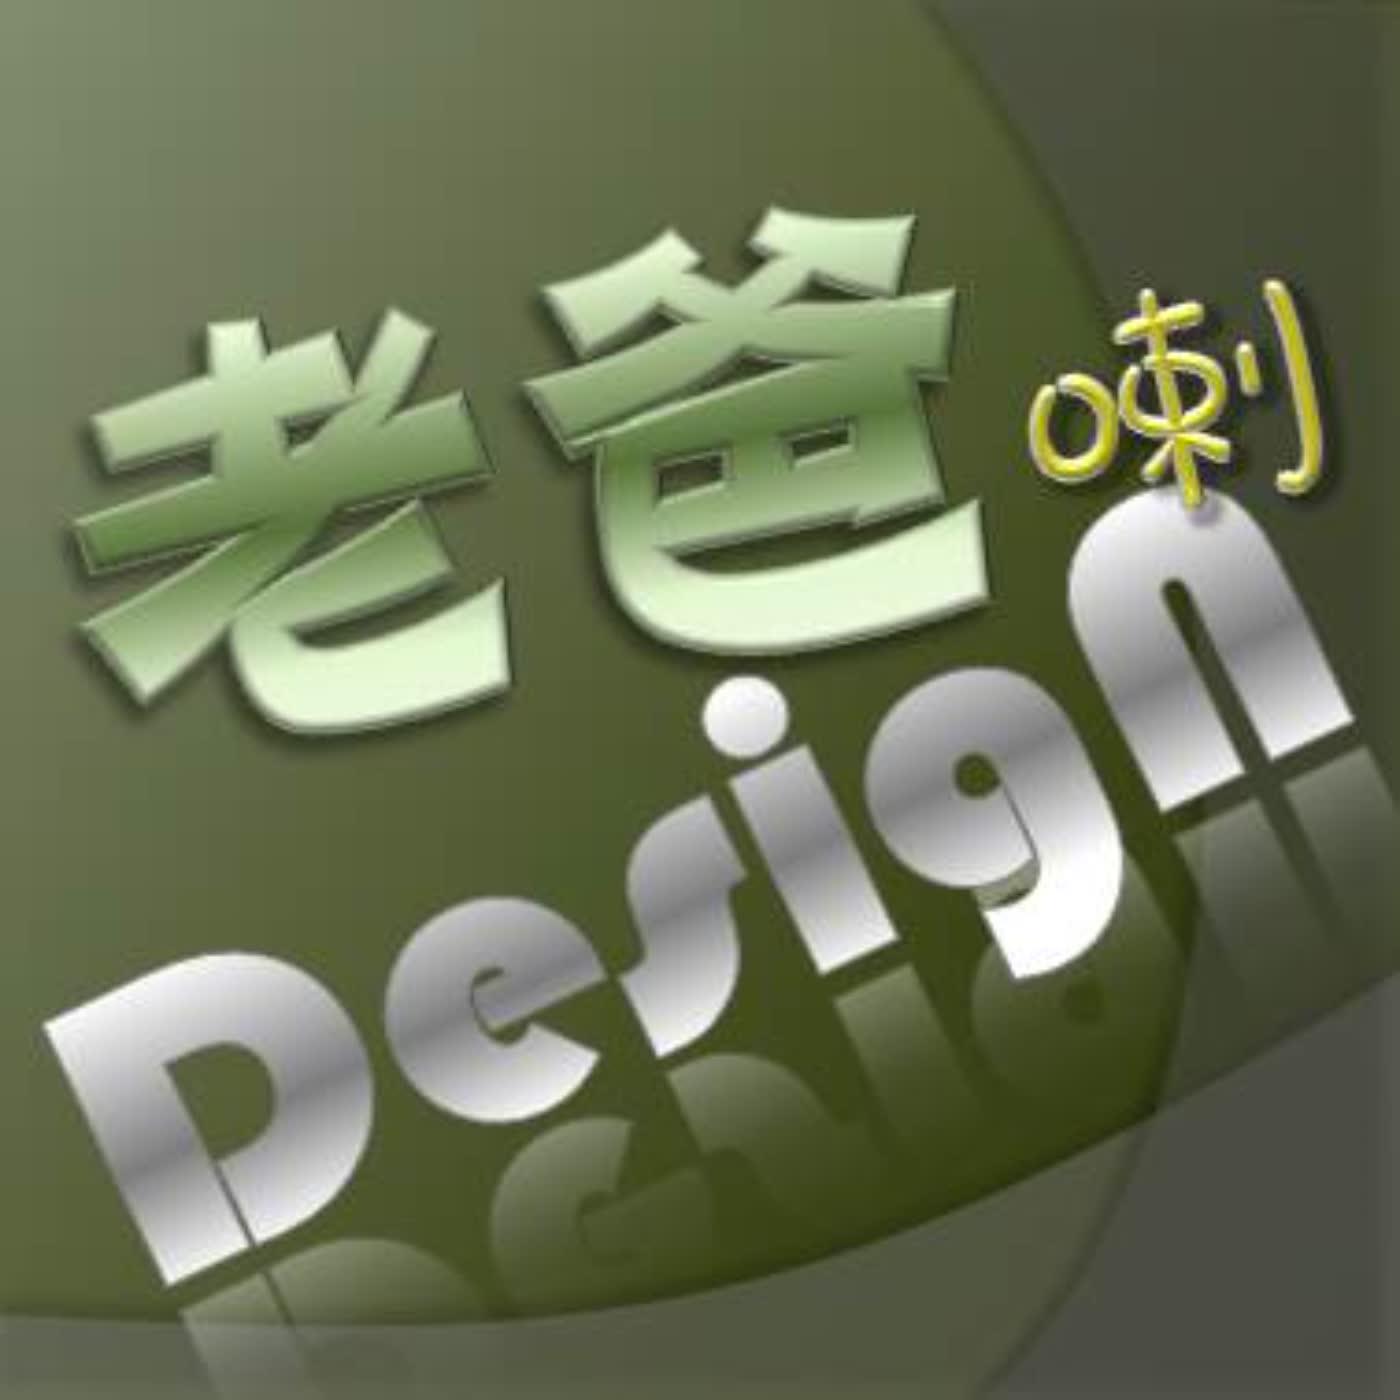 老爸喇DesigN | 設計x生活